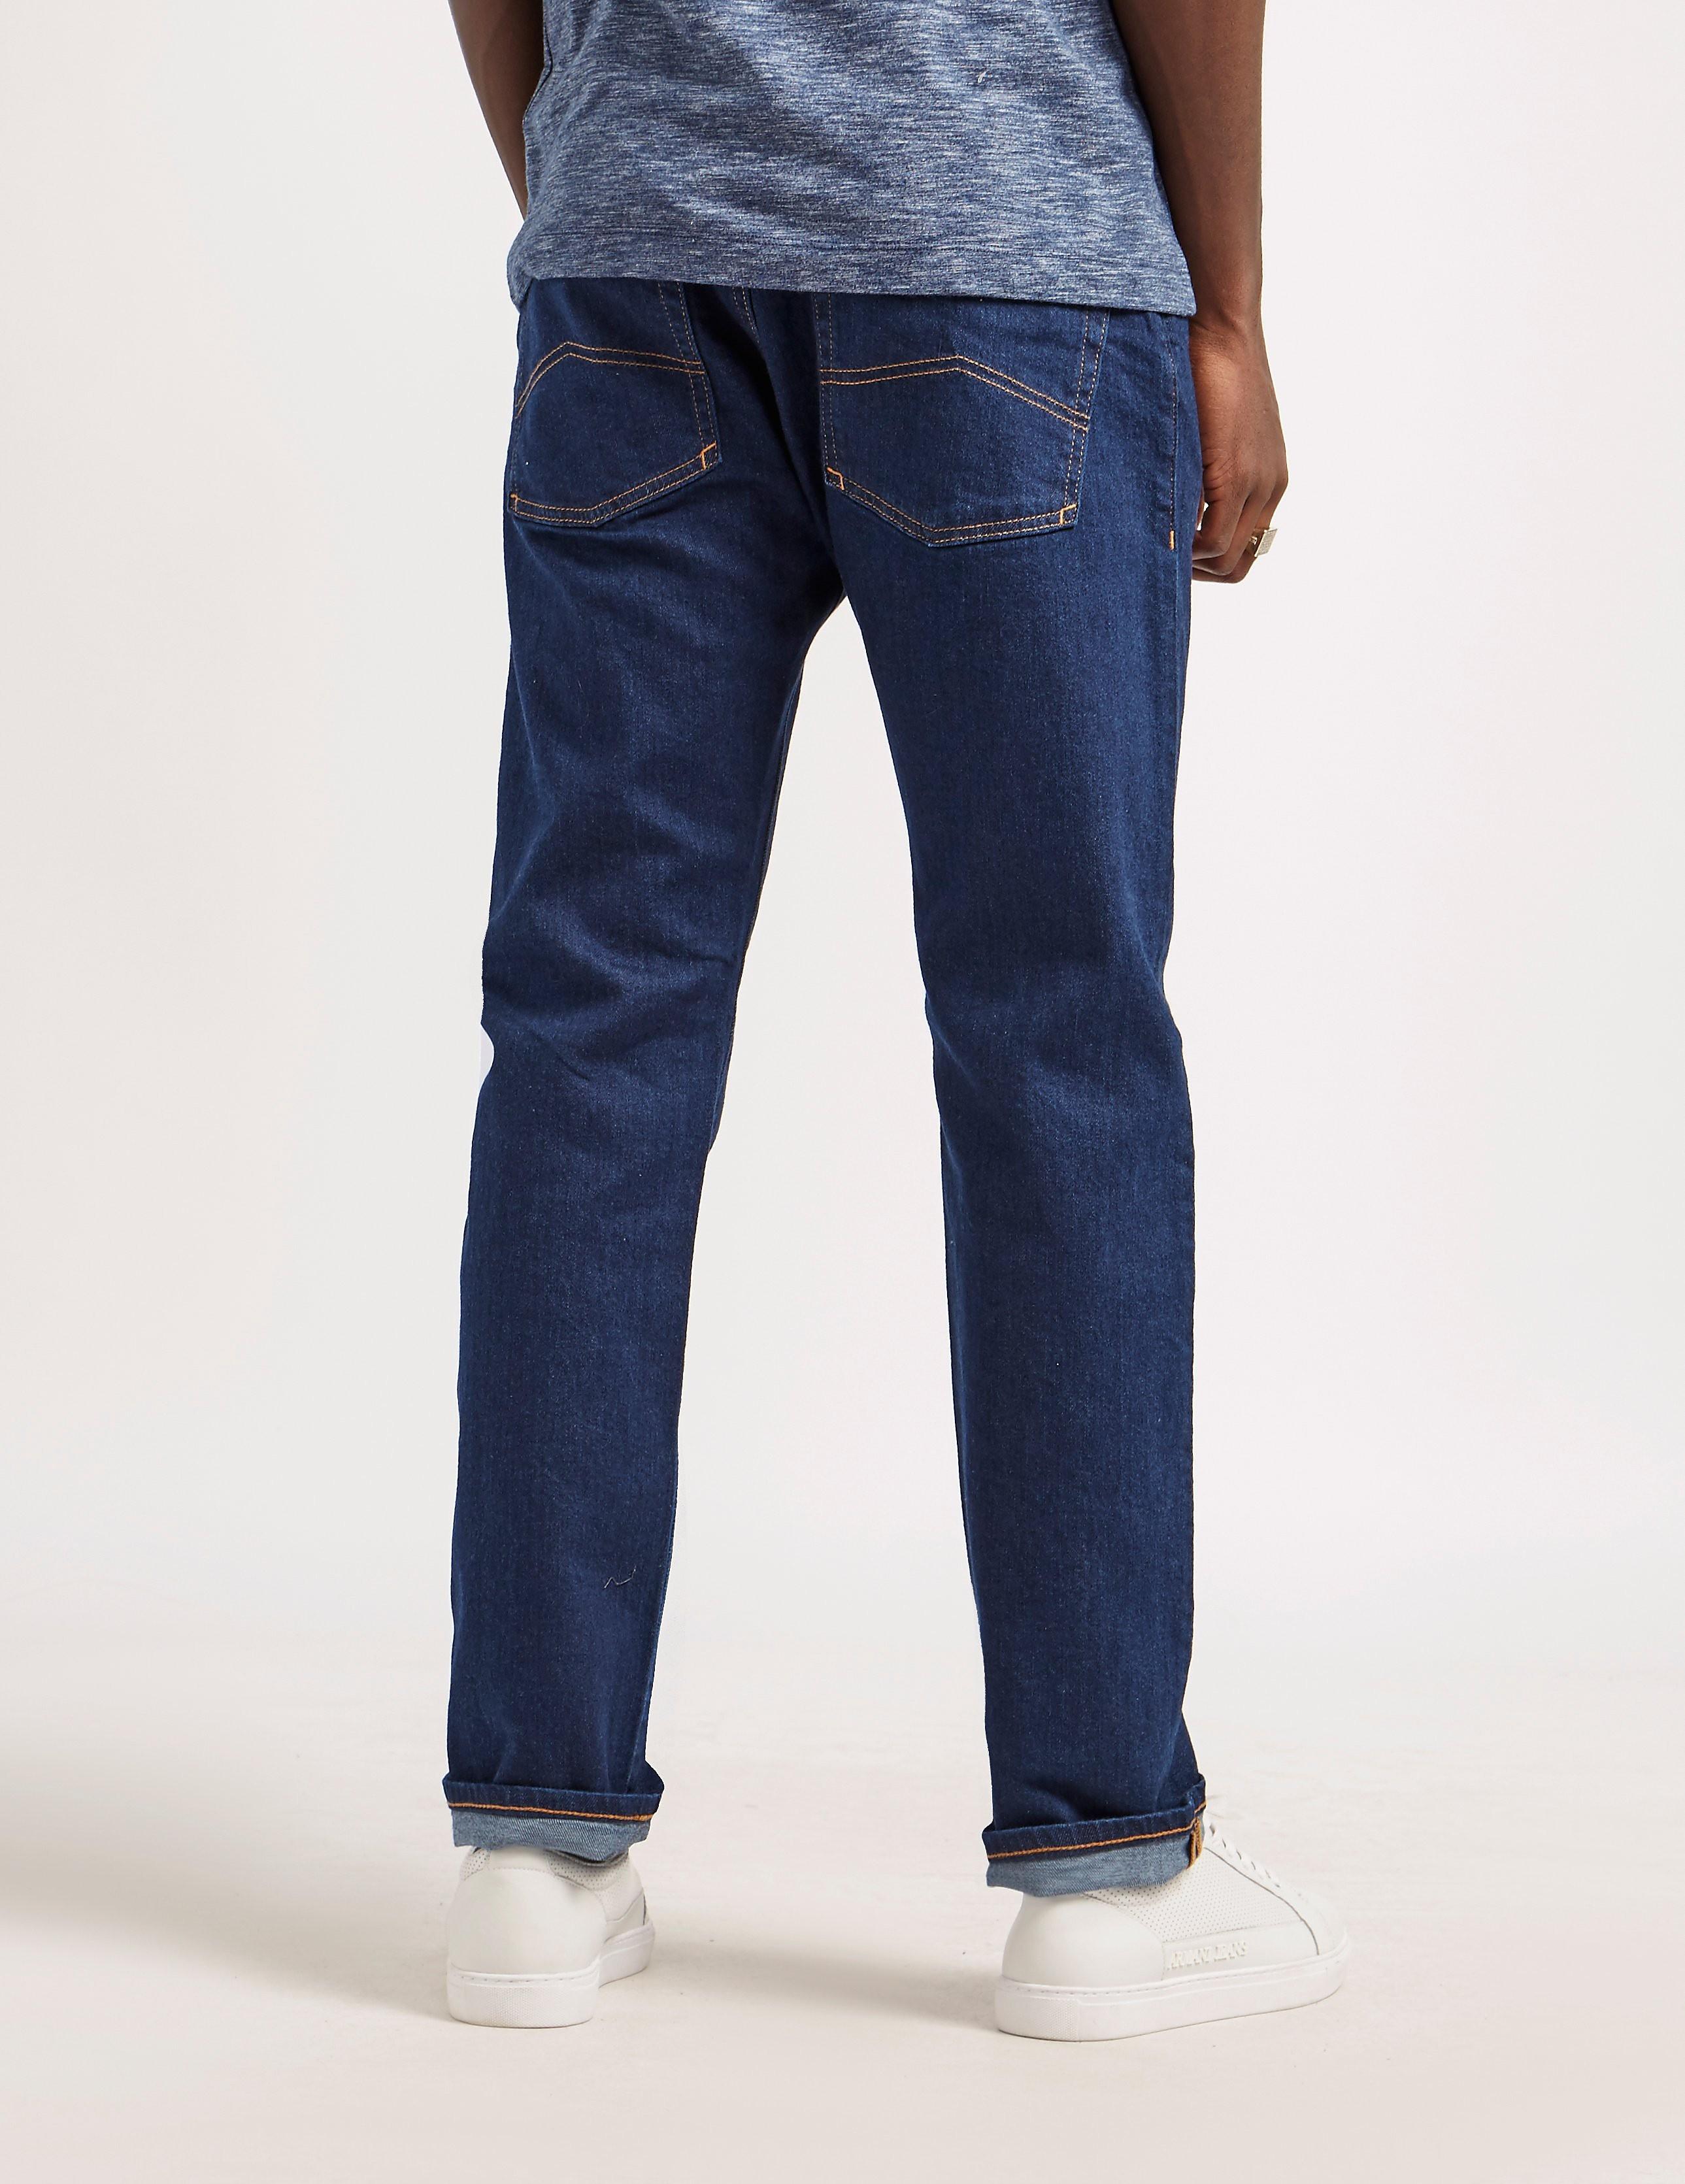 Armani Jeans J45 Short Jeans